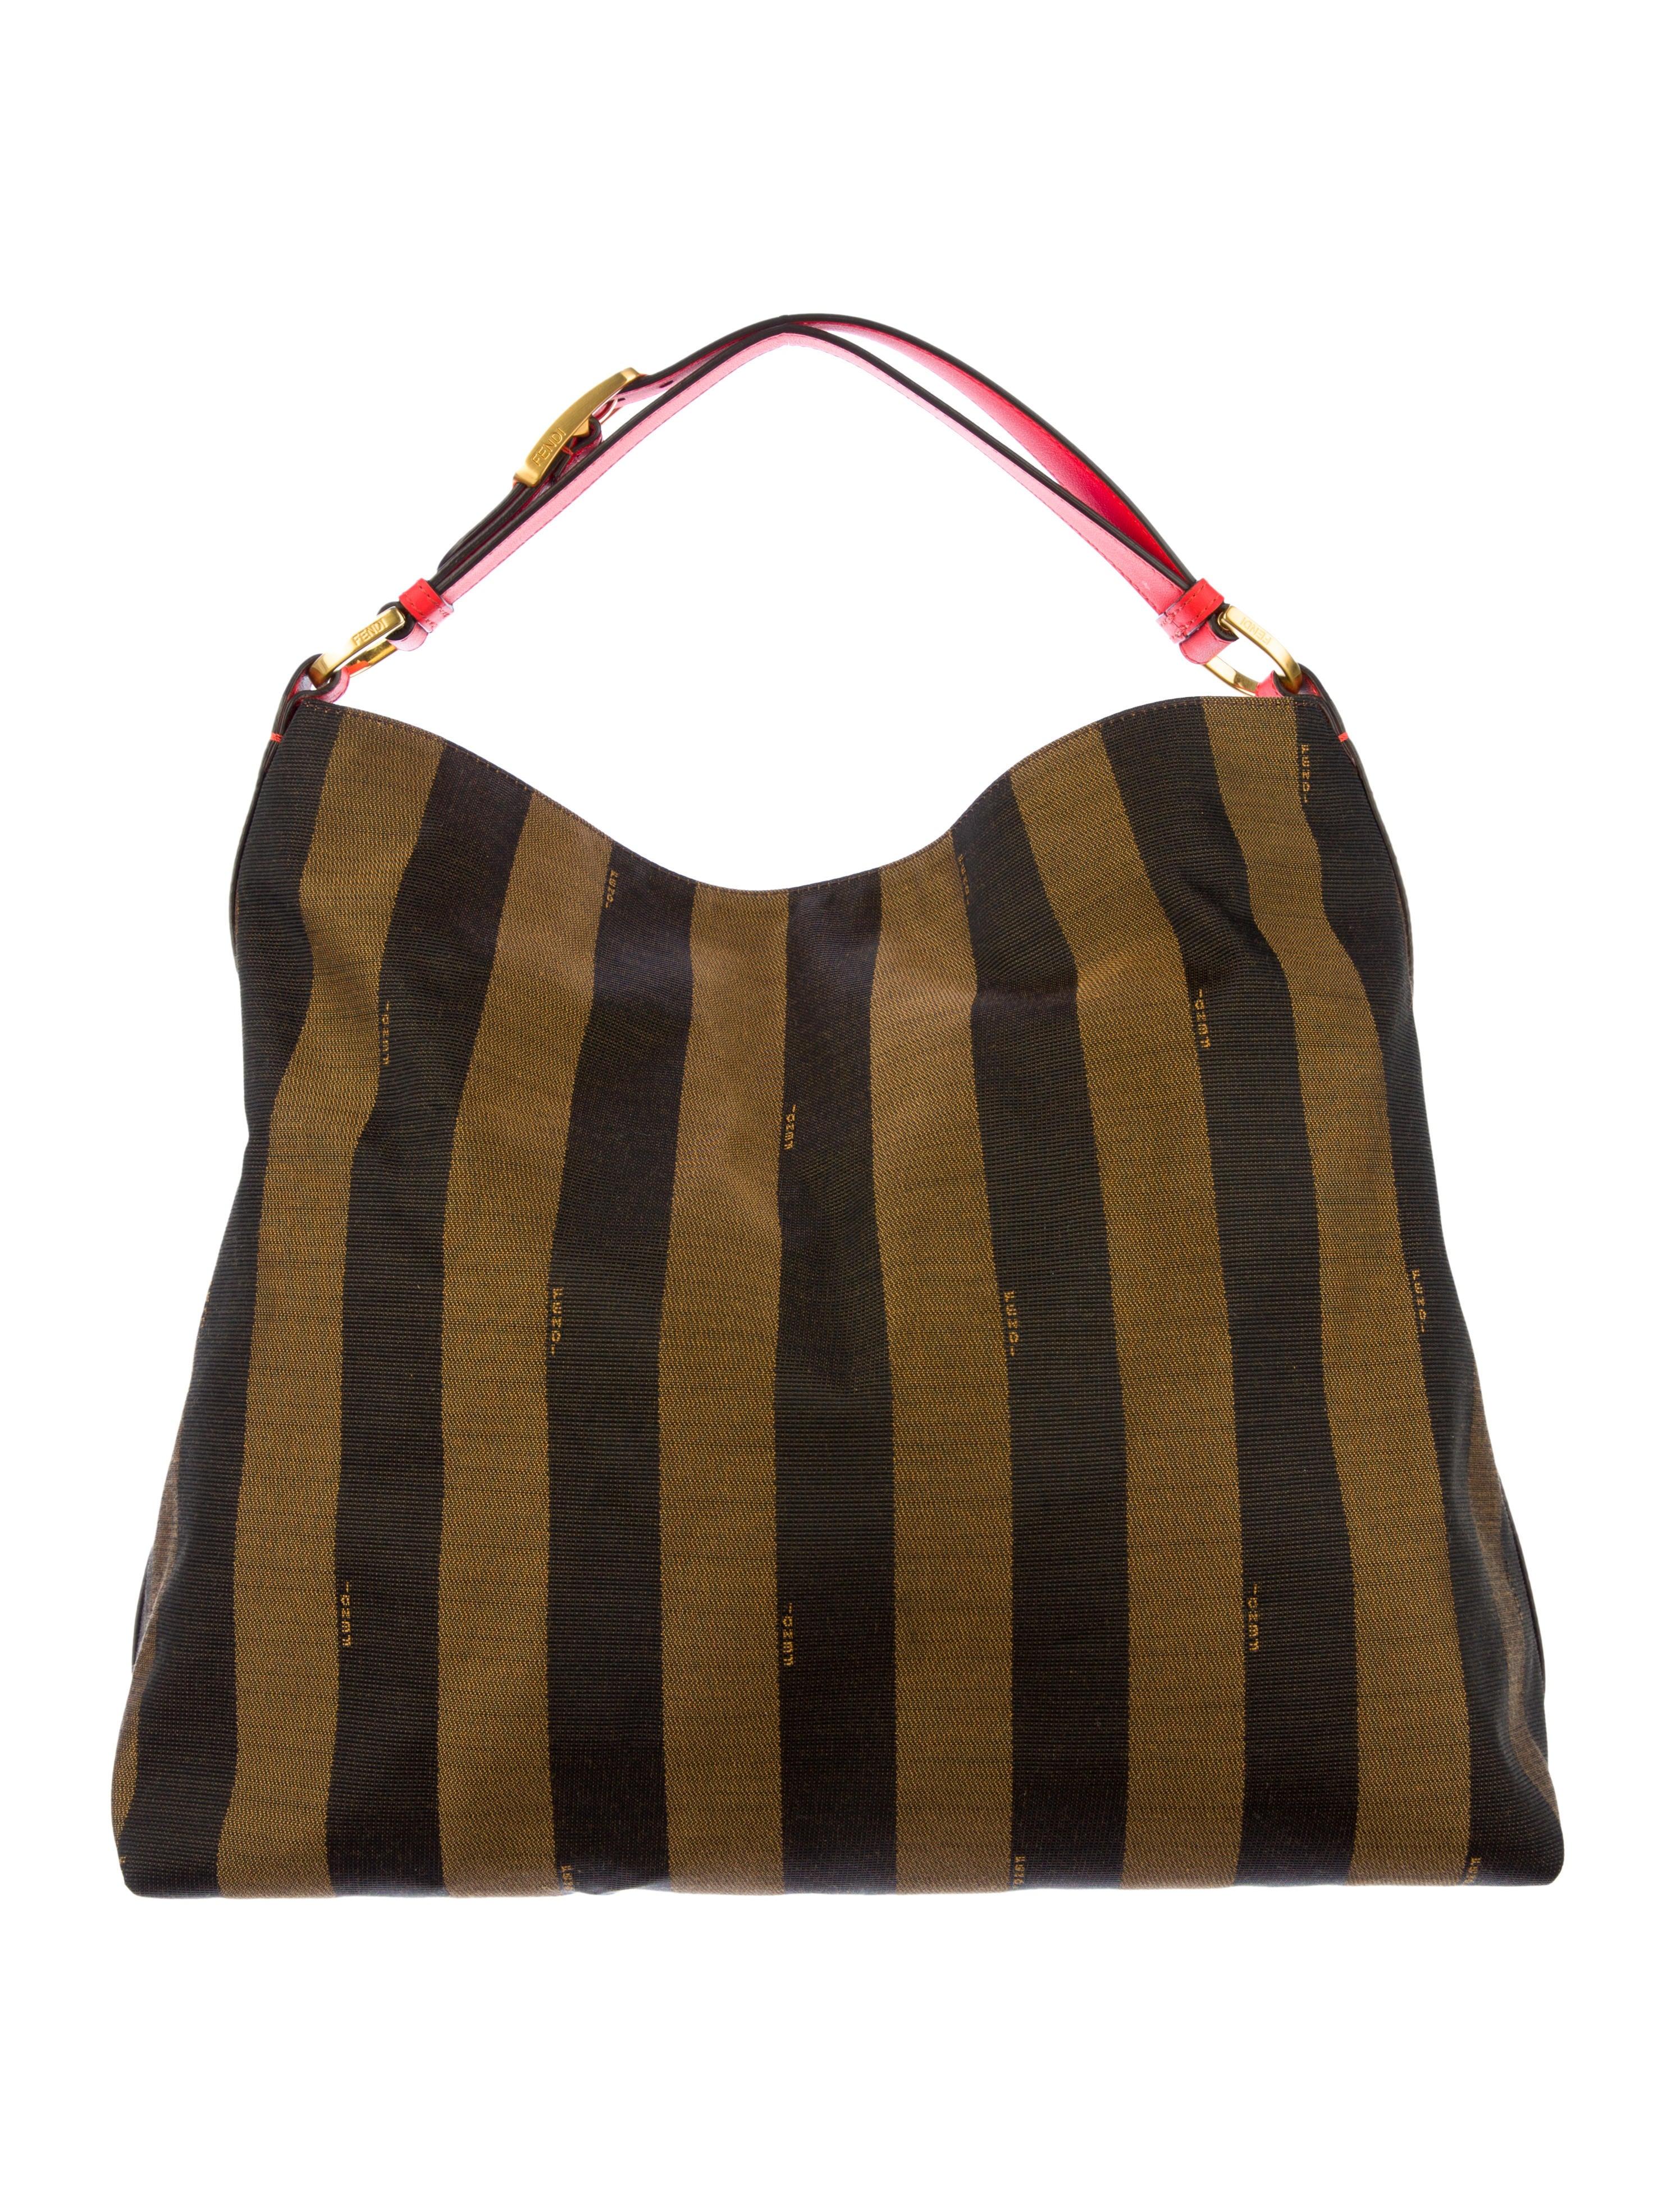 a8218179a5d Fendi Pequin Borsa Hobo - Handbags - FEN25771   The RealReal